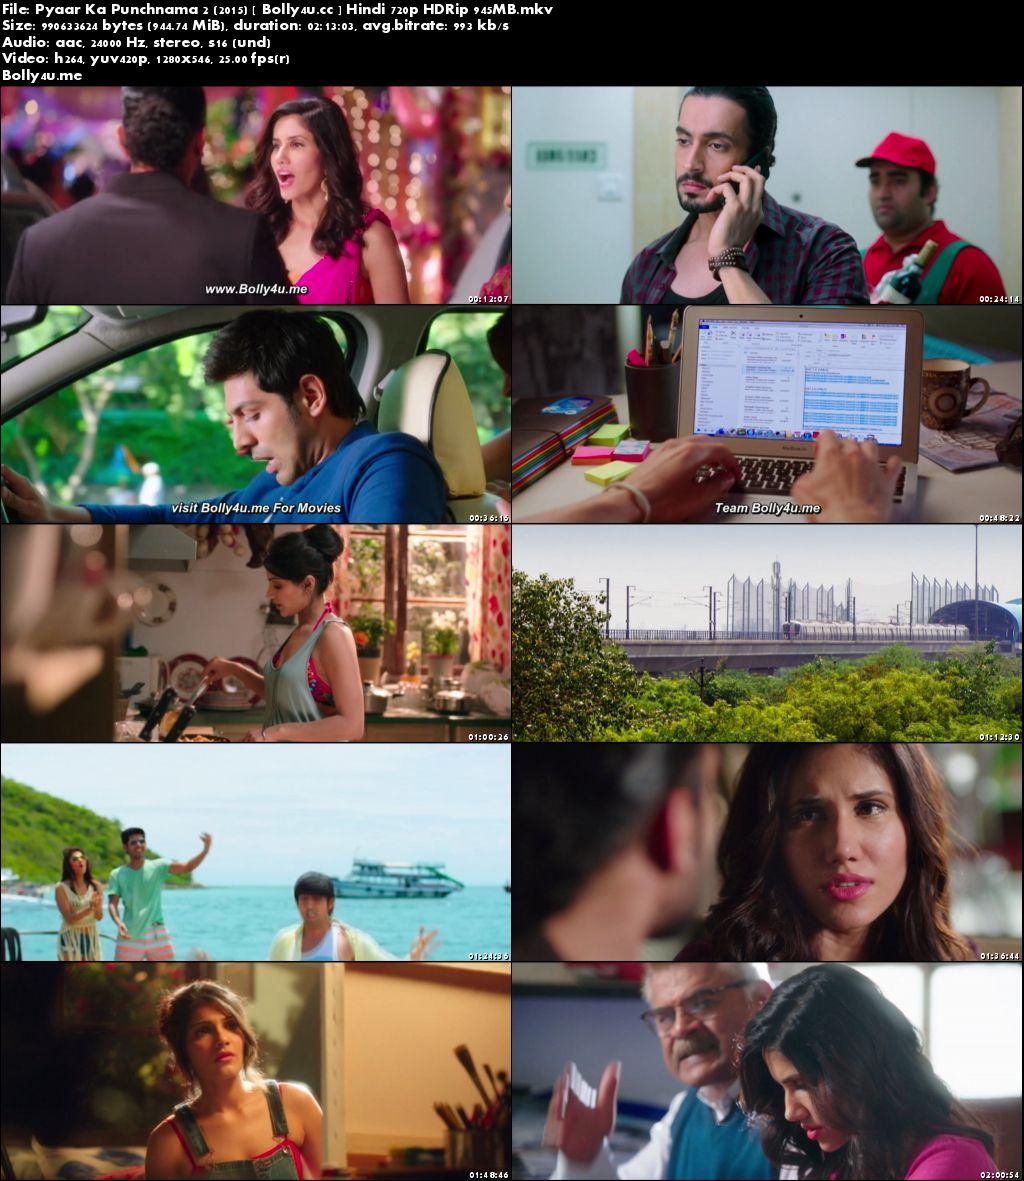 pyaar ka punchnama 2 full movie free download